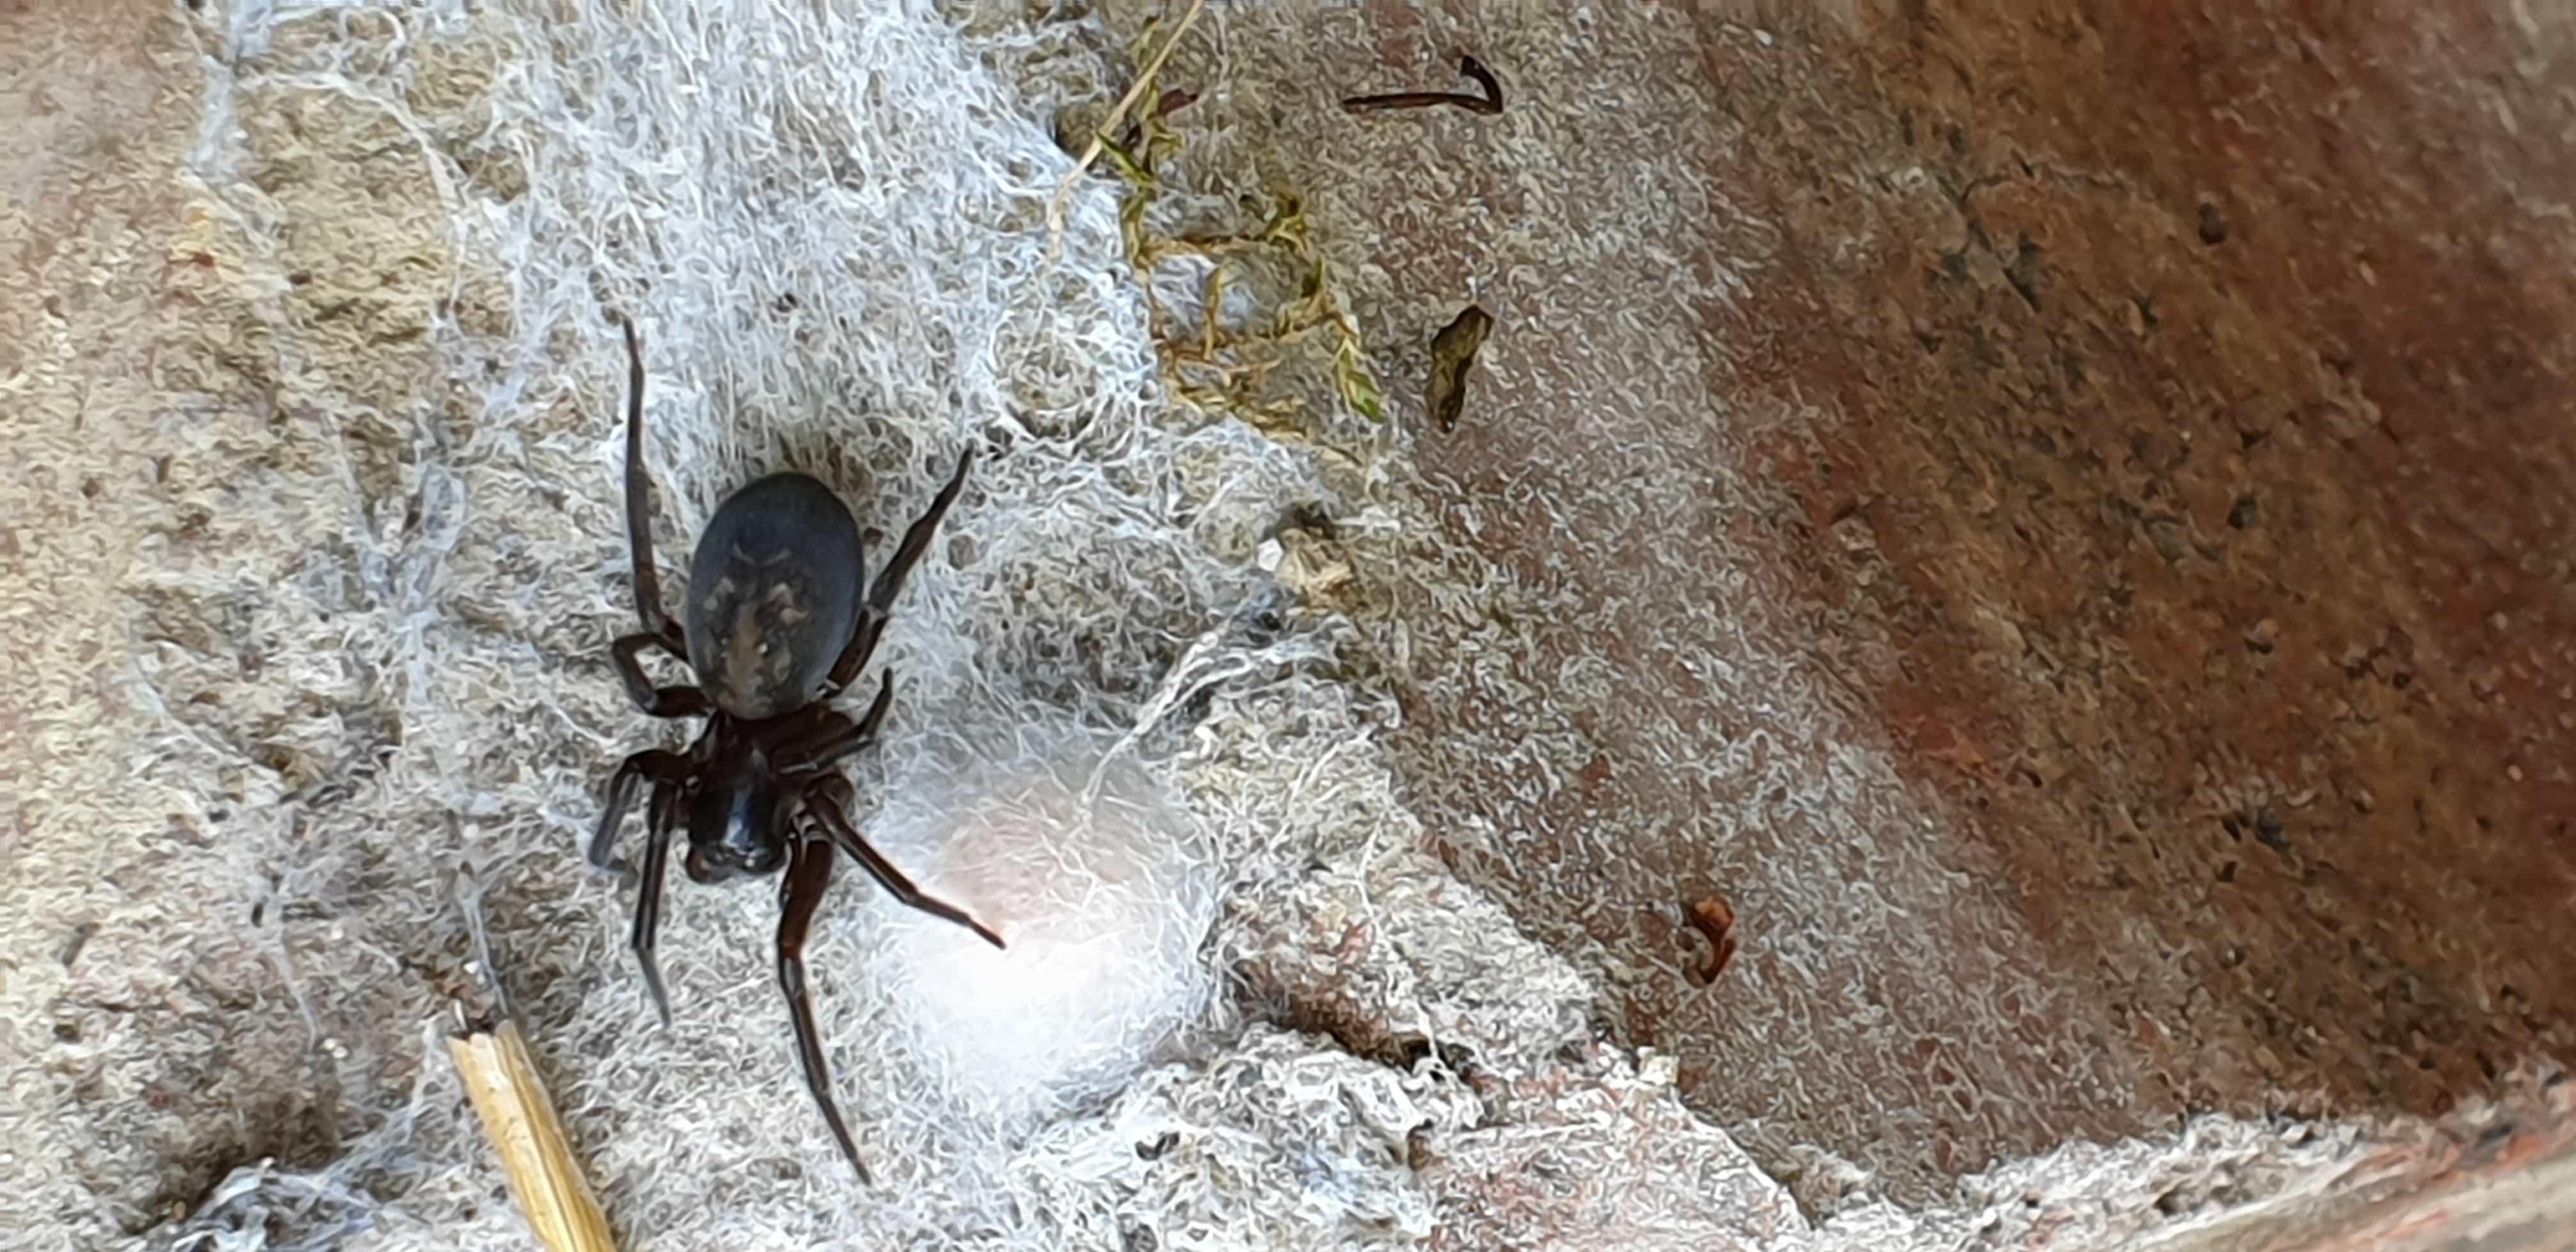 Picture of Amaurobius ferox (Black Lace-Weaver) - Female - Dorsal,Egg sacs,Webs